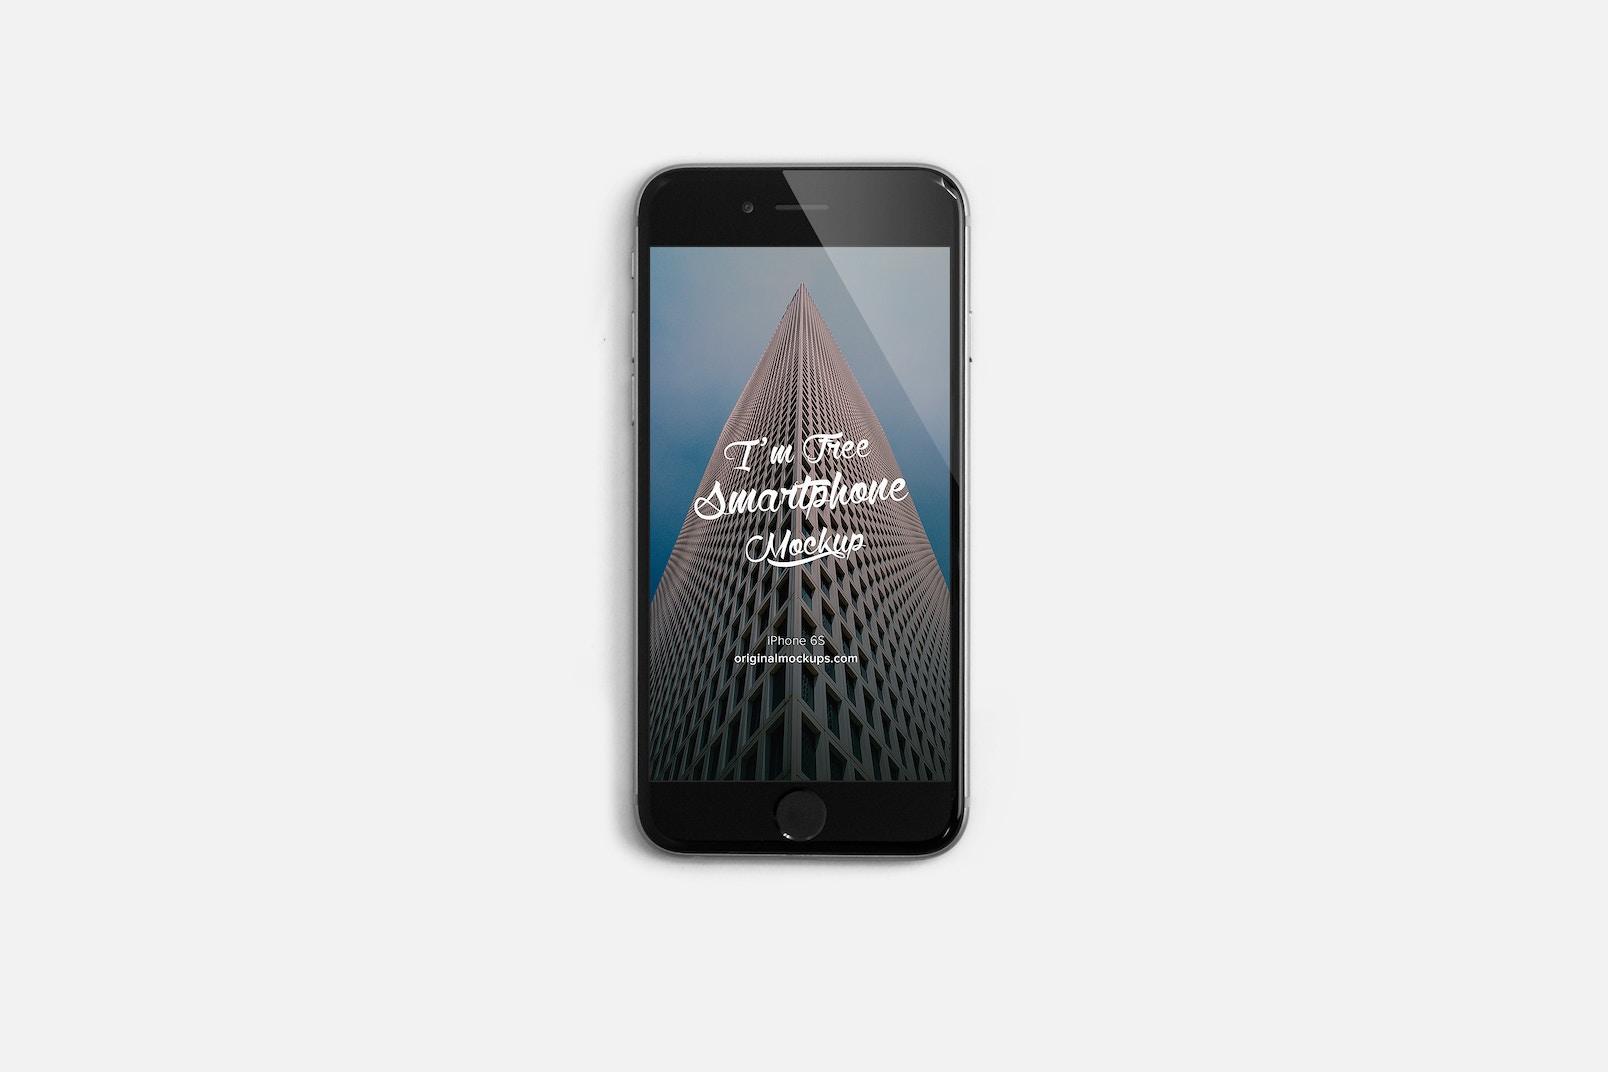 Maqueta de iPhone 6S Gratis